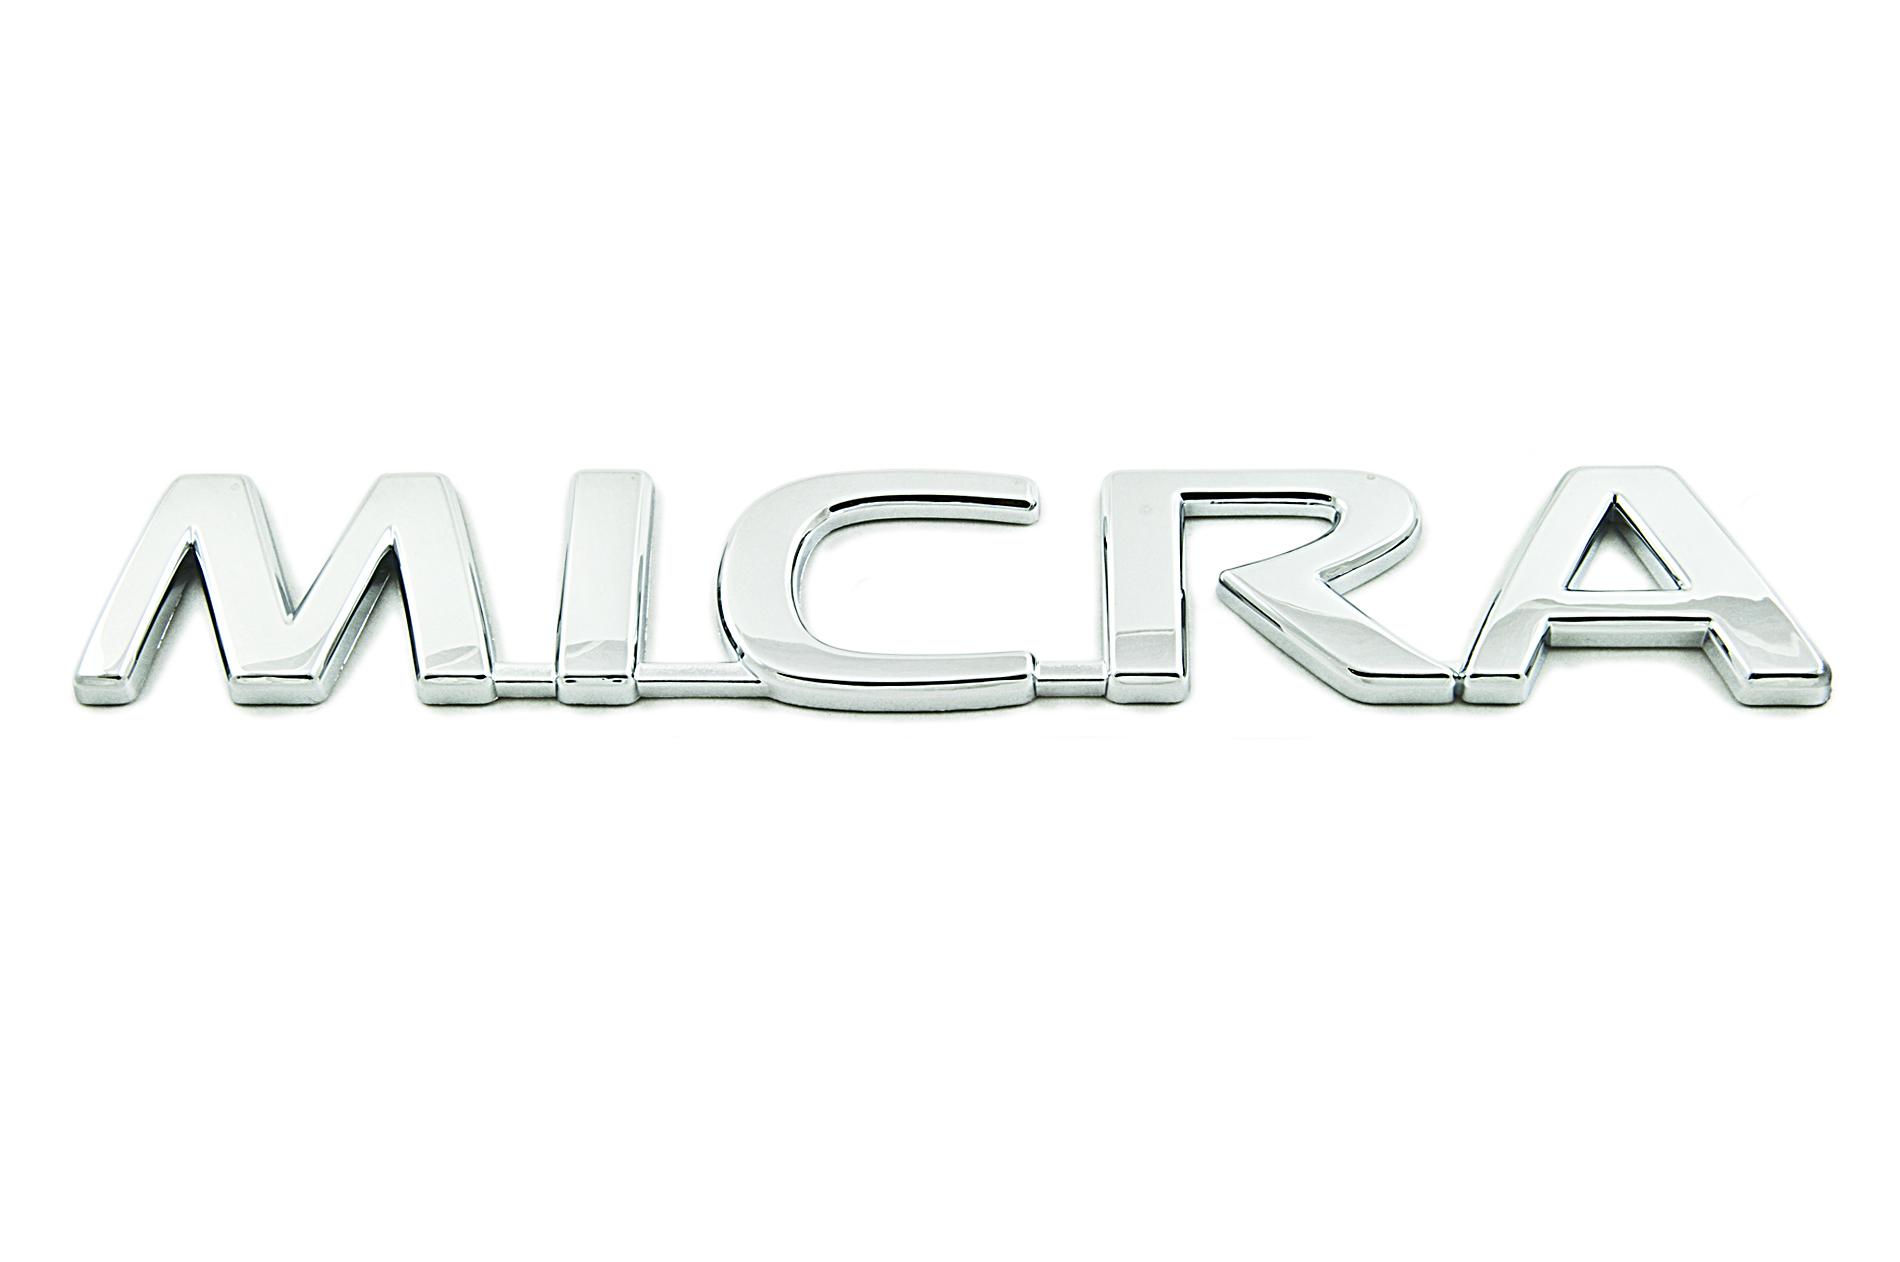 Nissan Genuine Micra Chrome Badge Emblem Rear For Boot